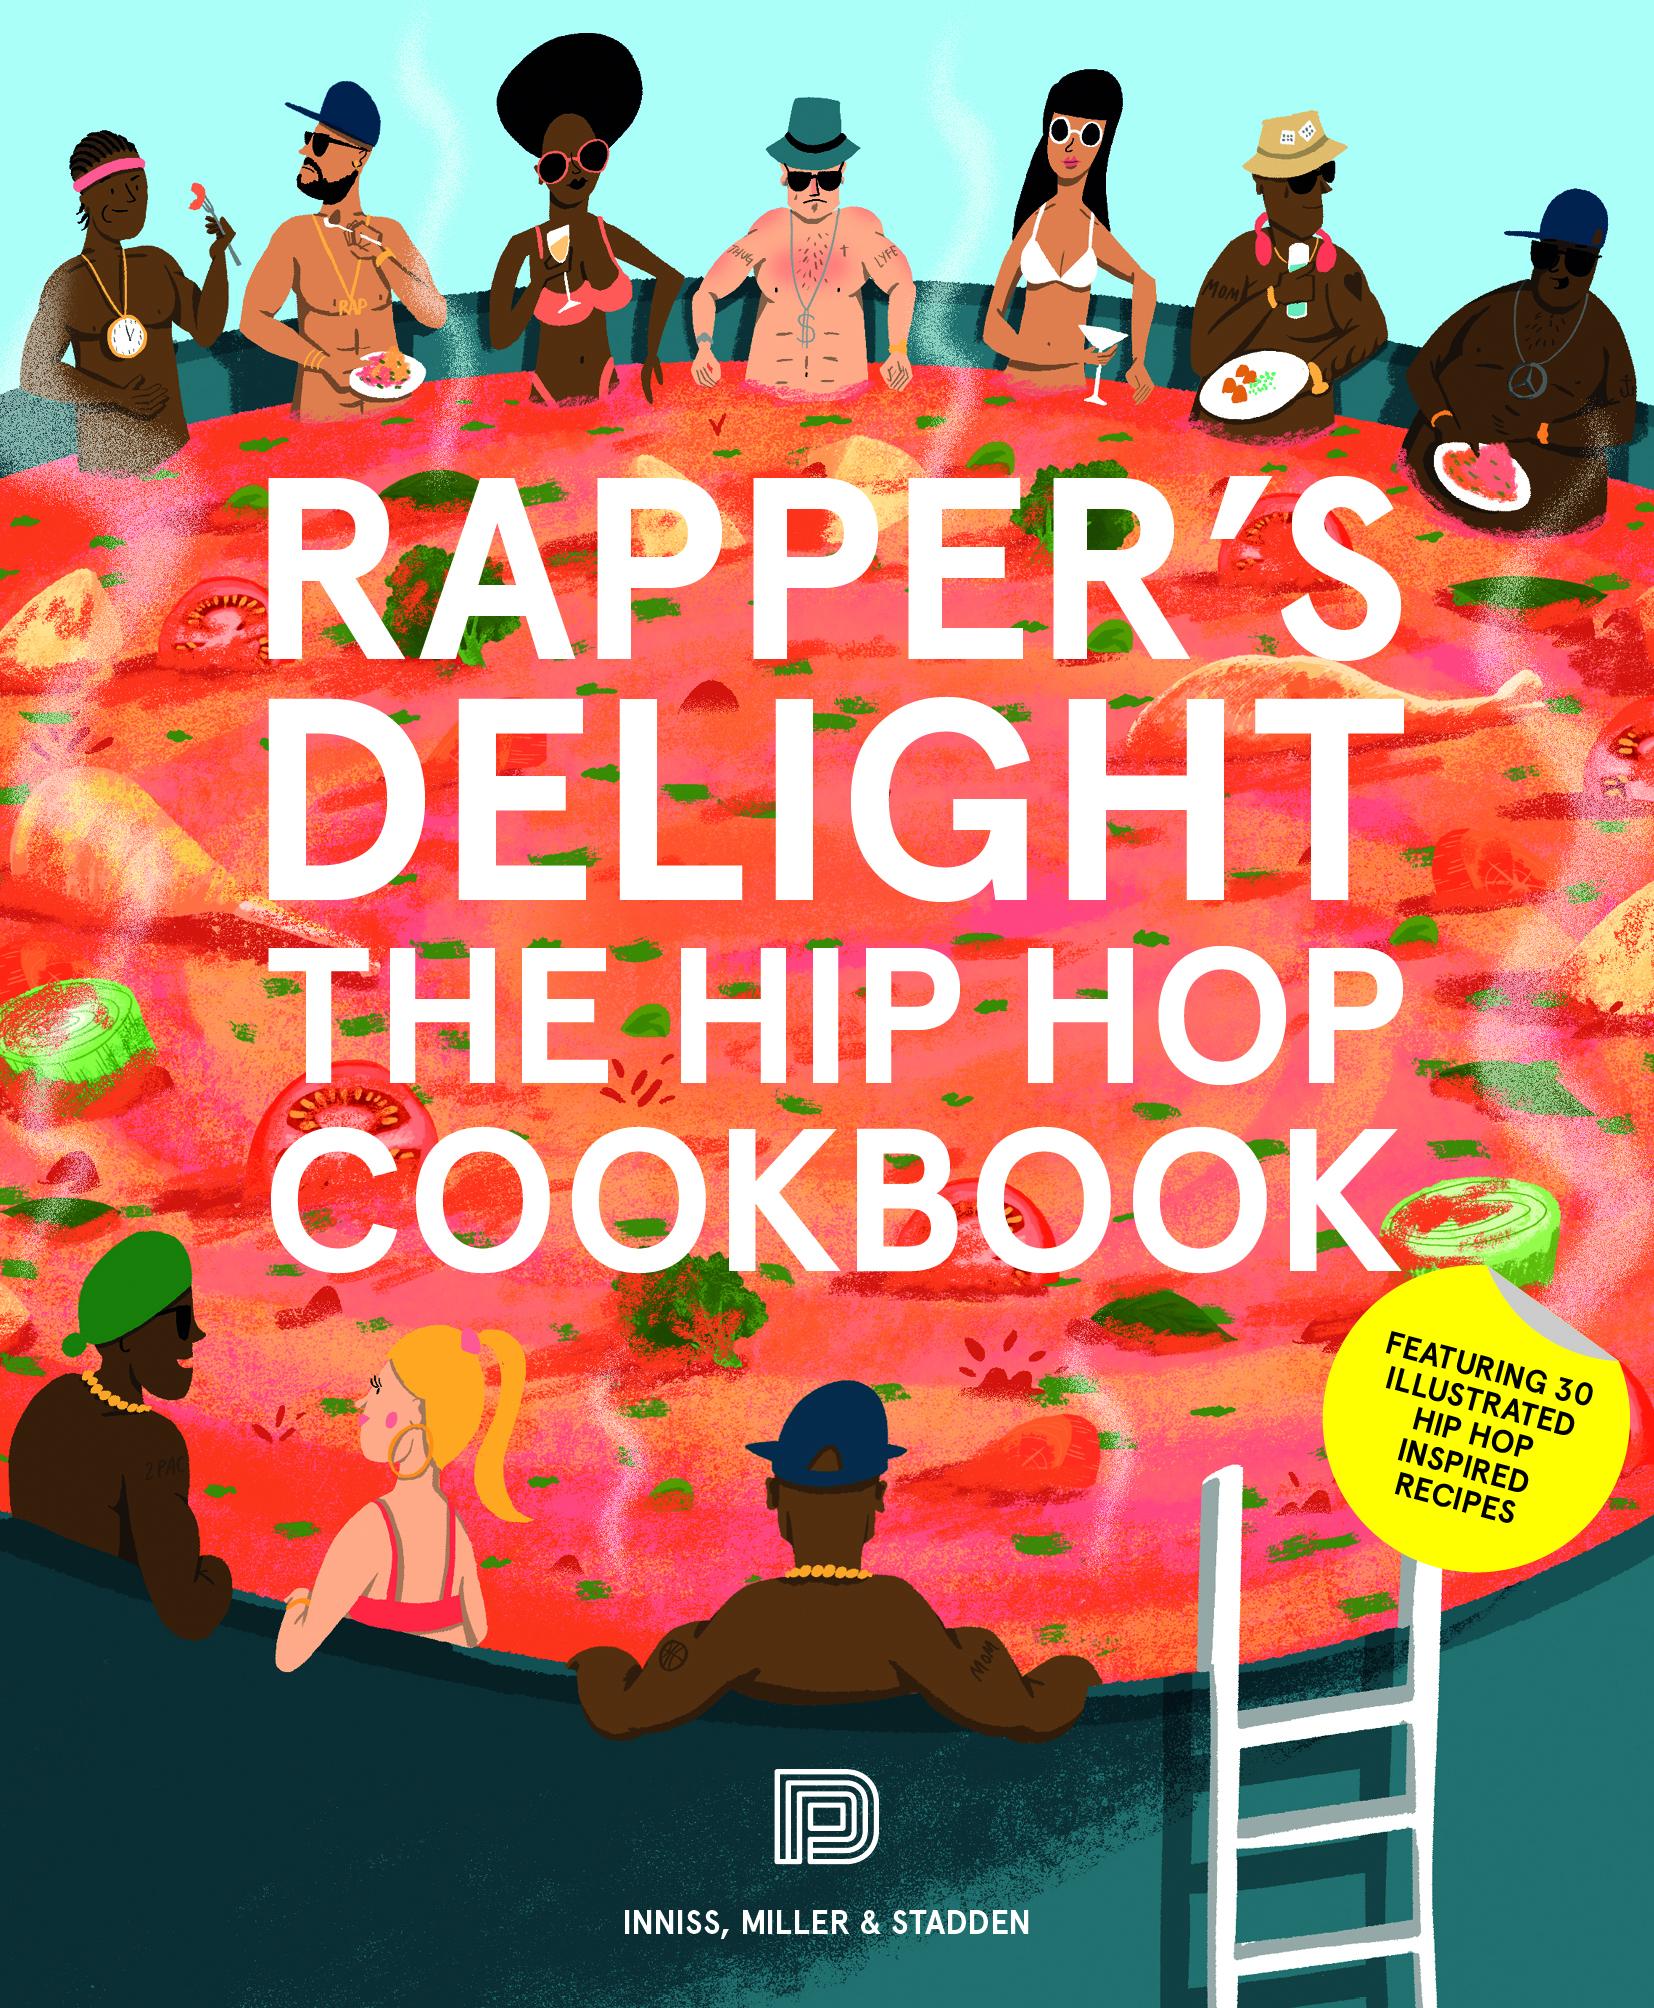 Rapper's delight cookbook, Rap cookbook, Snoop Dogg, Ludacris, Notorious BIG, Missy Elliott, Free recipes, Easy recipes, Duck, Tiramisu, Stroganoff